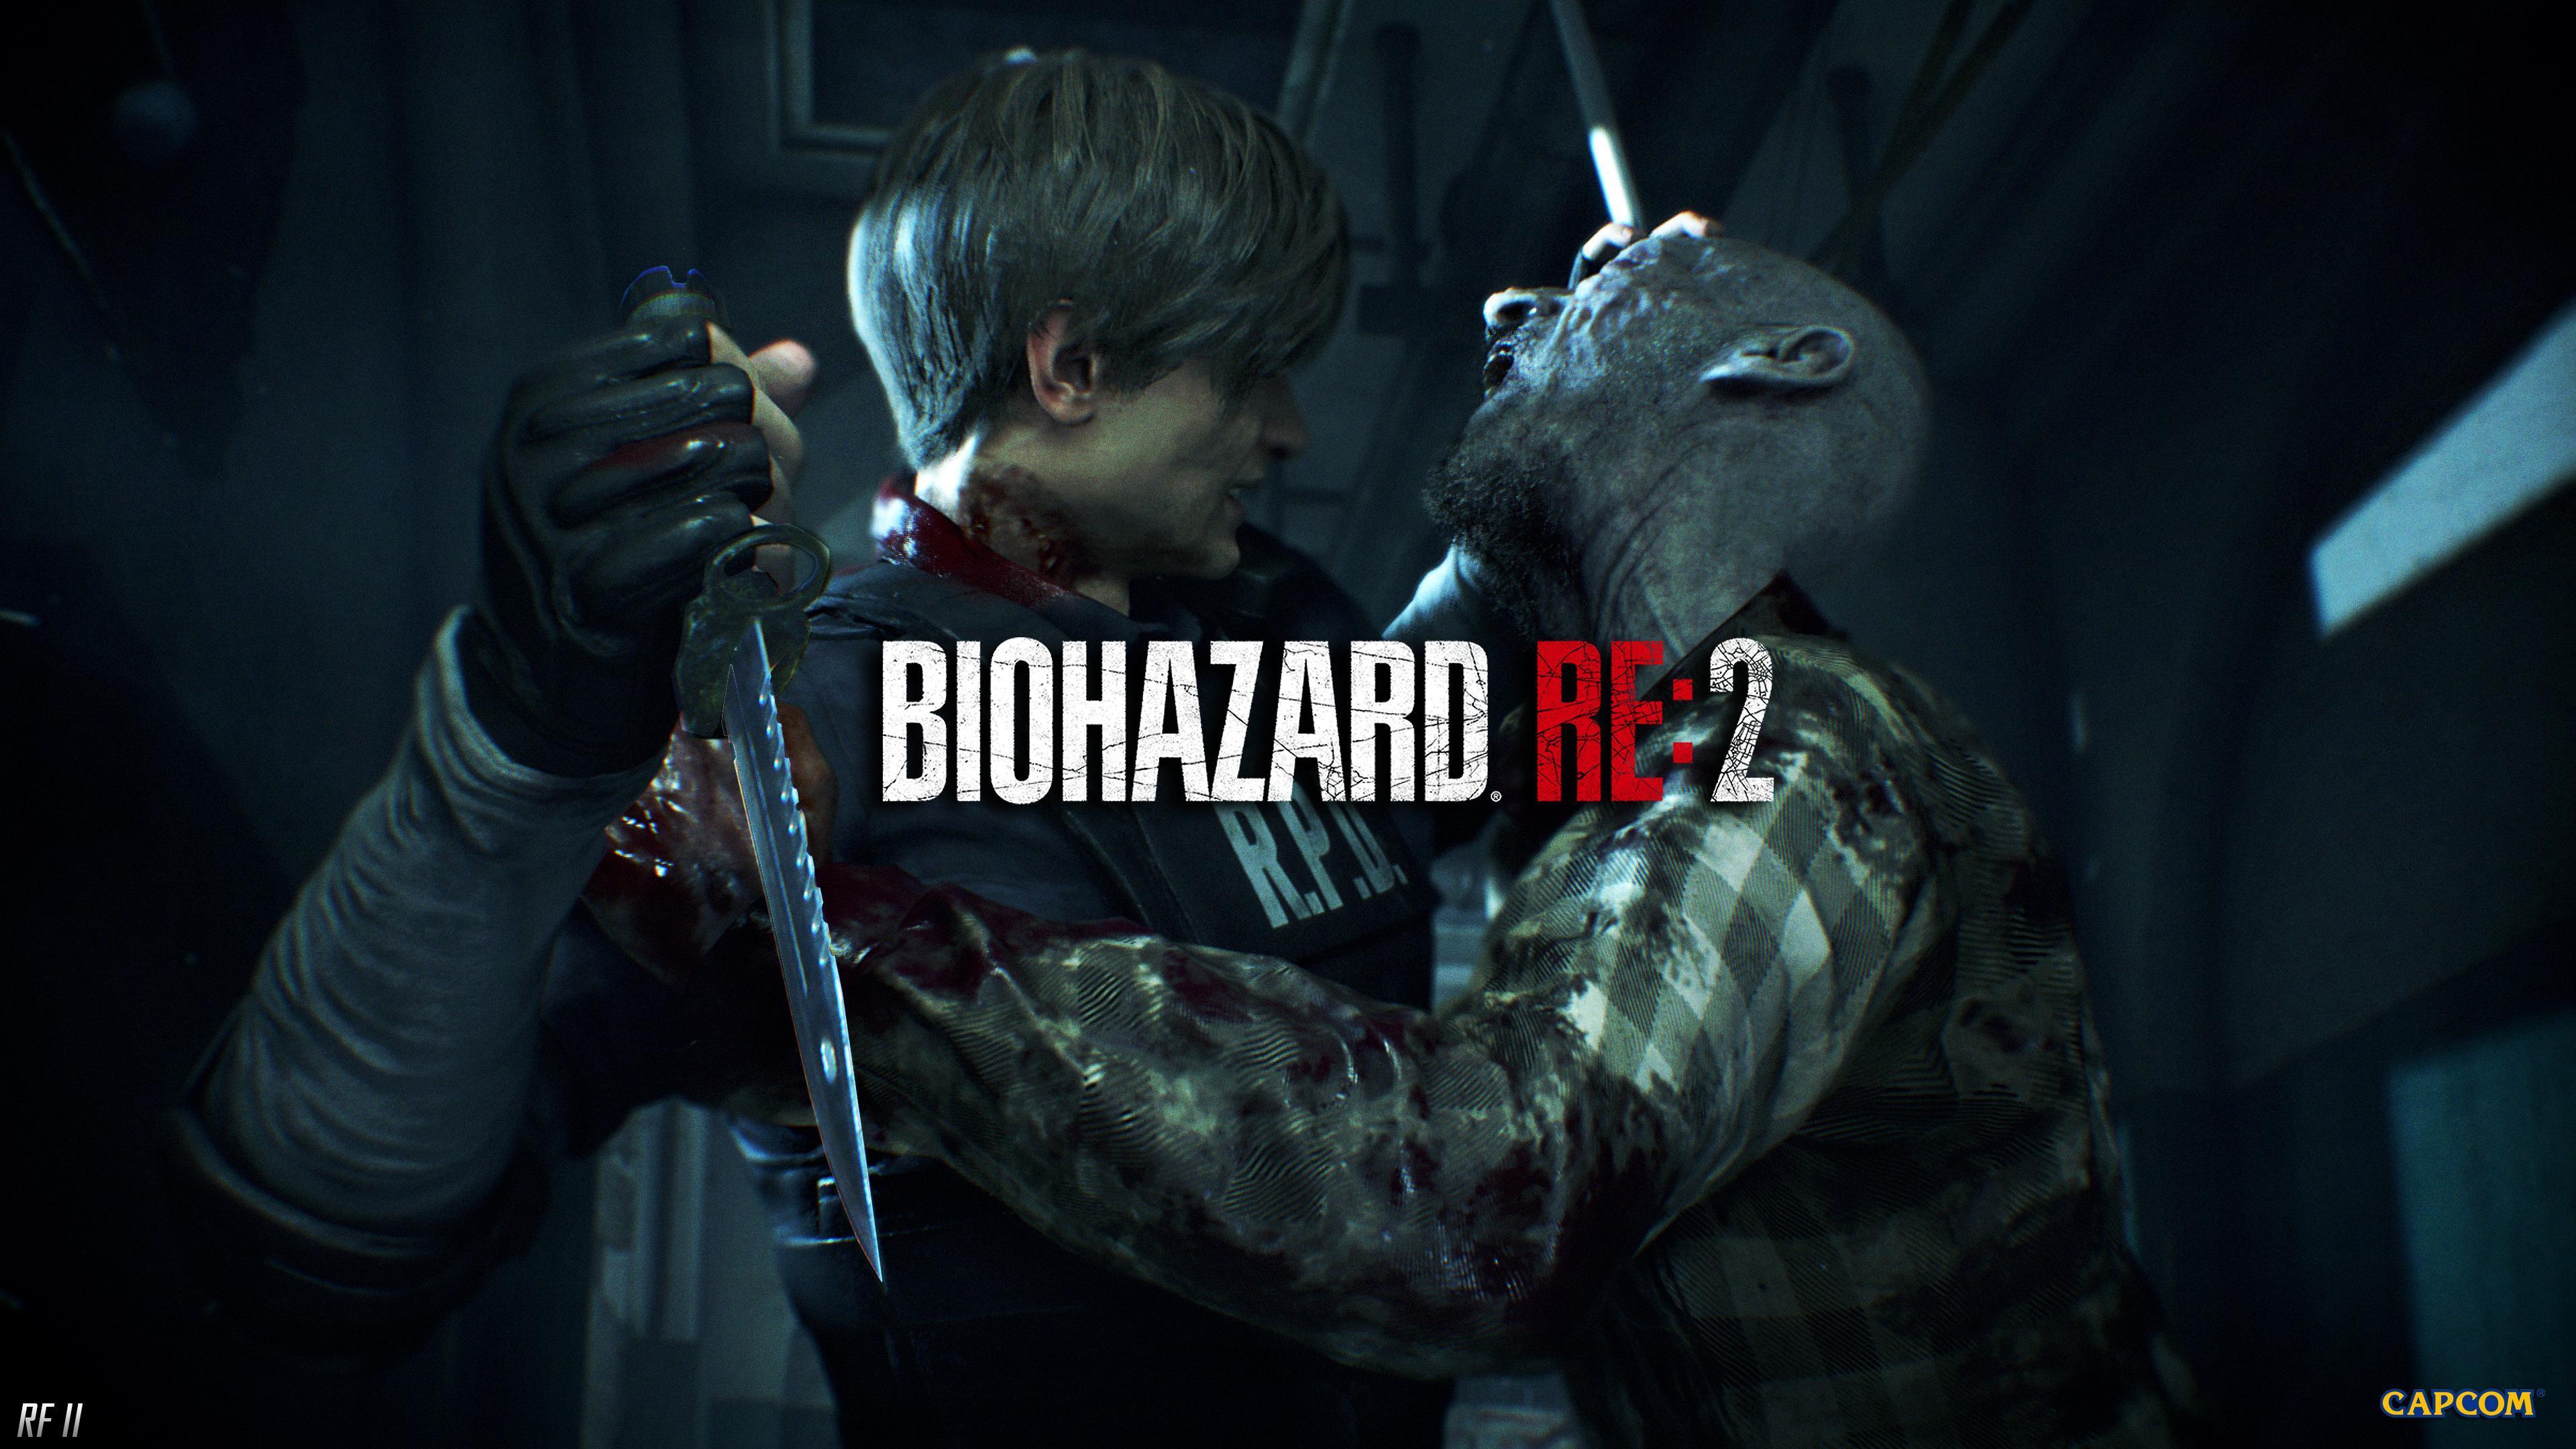 Resident Evil Remake Wallpapers Top Free Resident Evil Remake